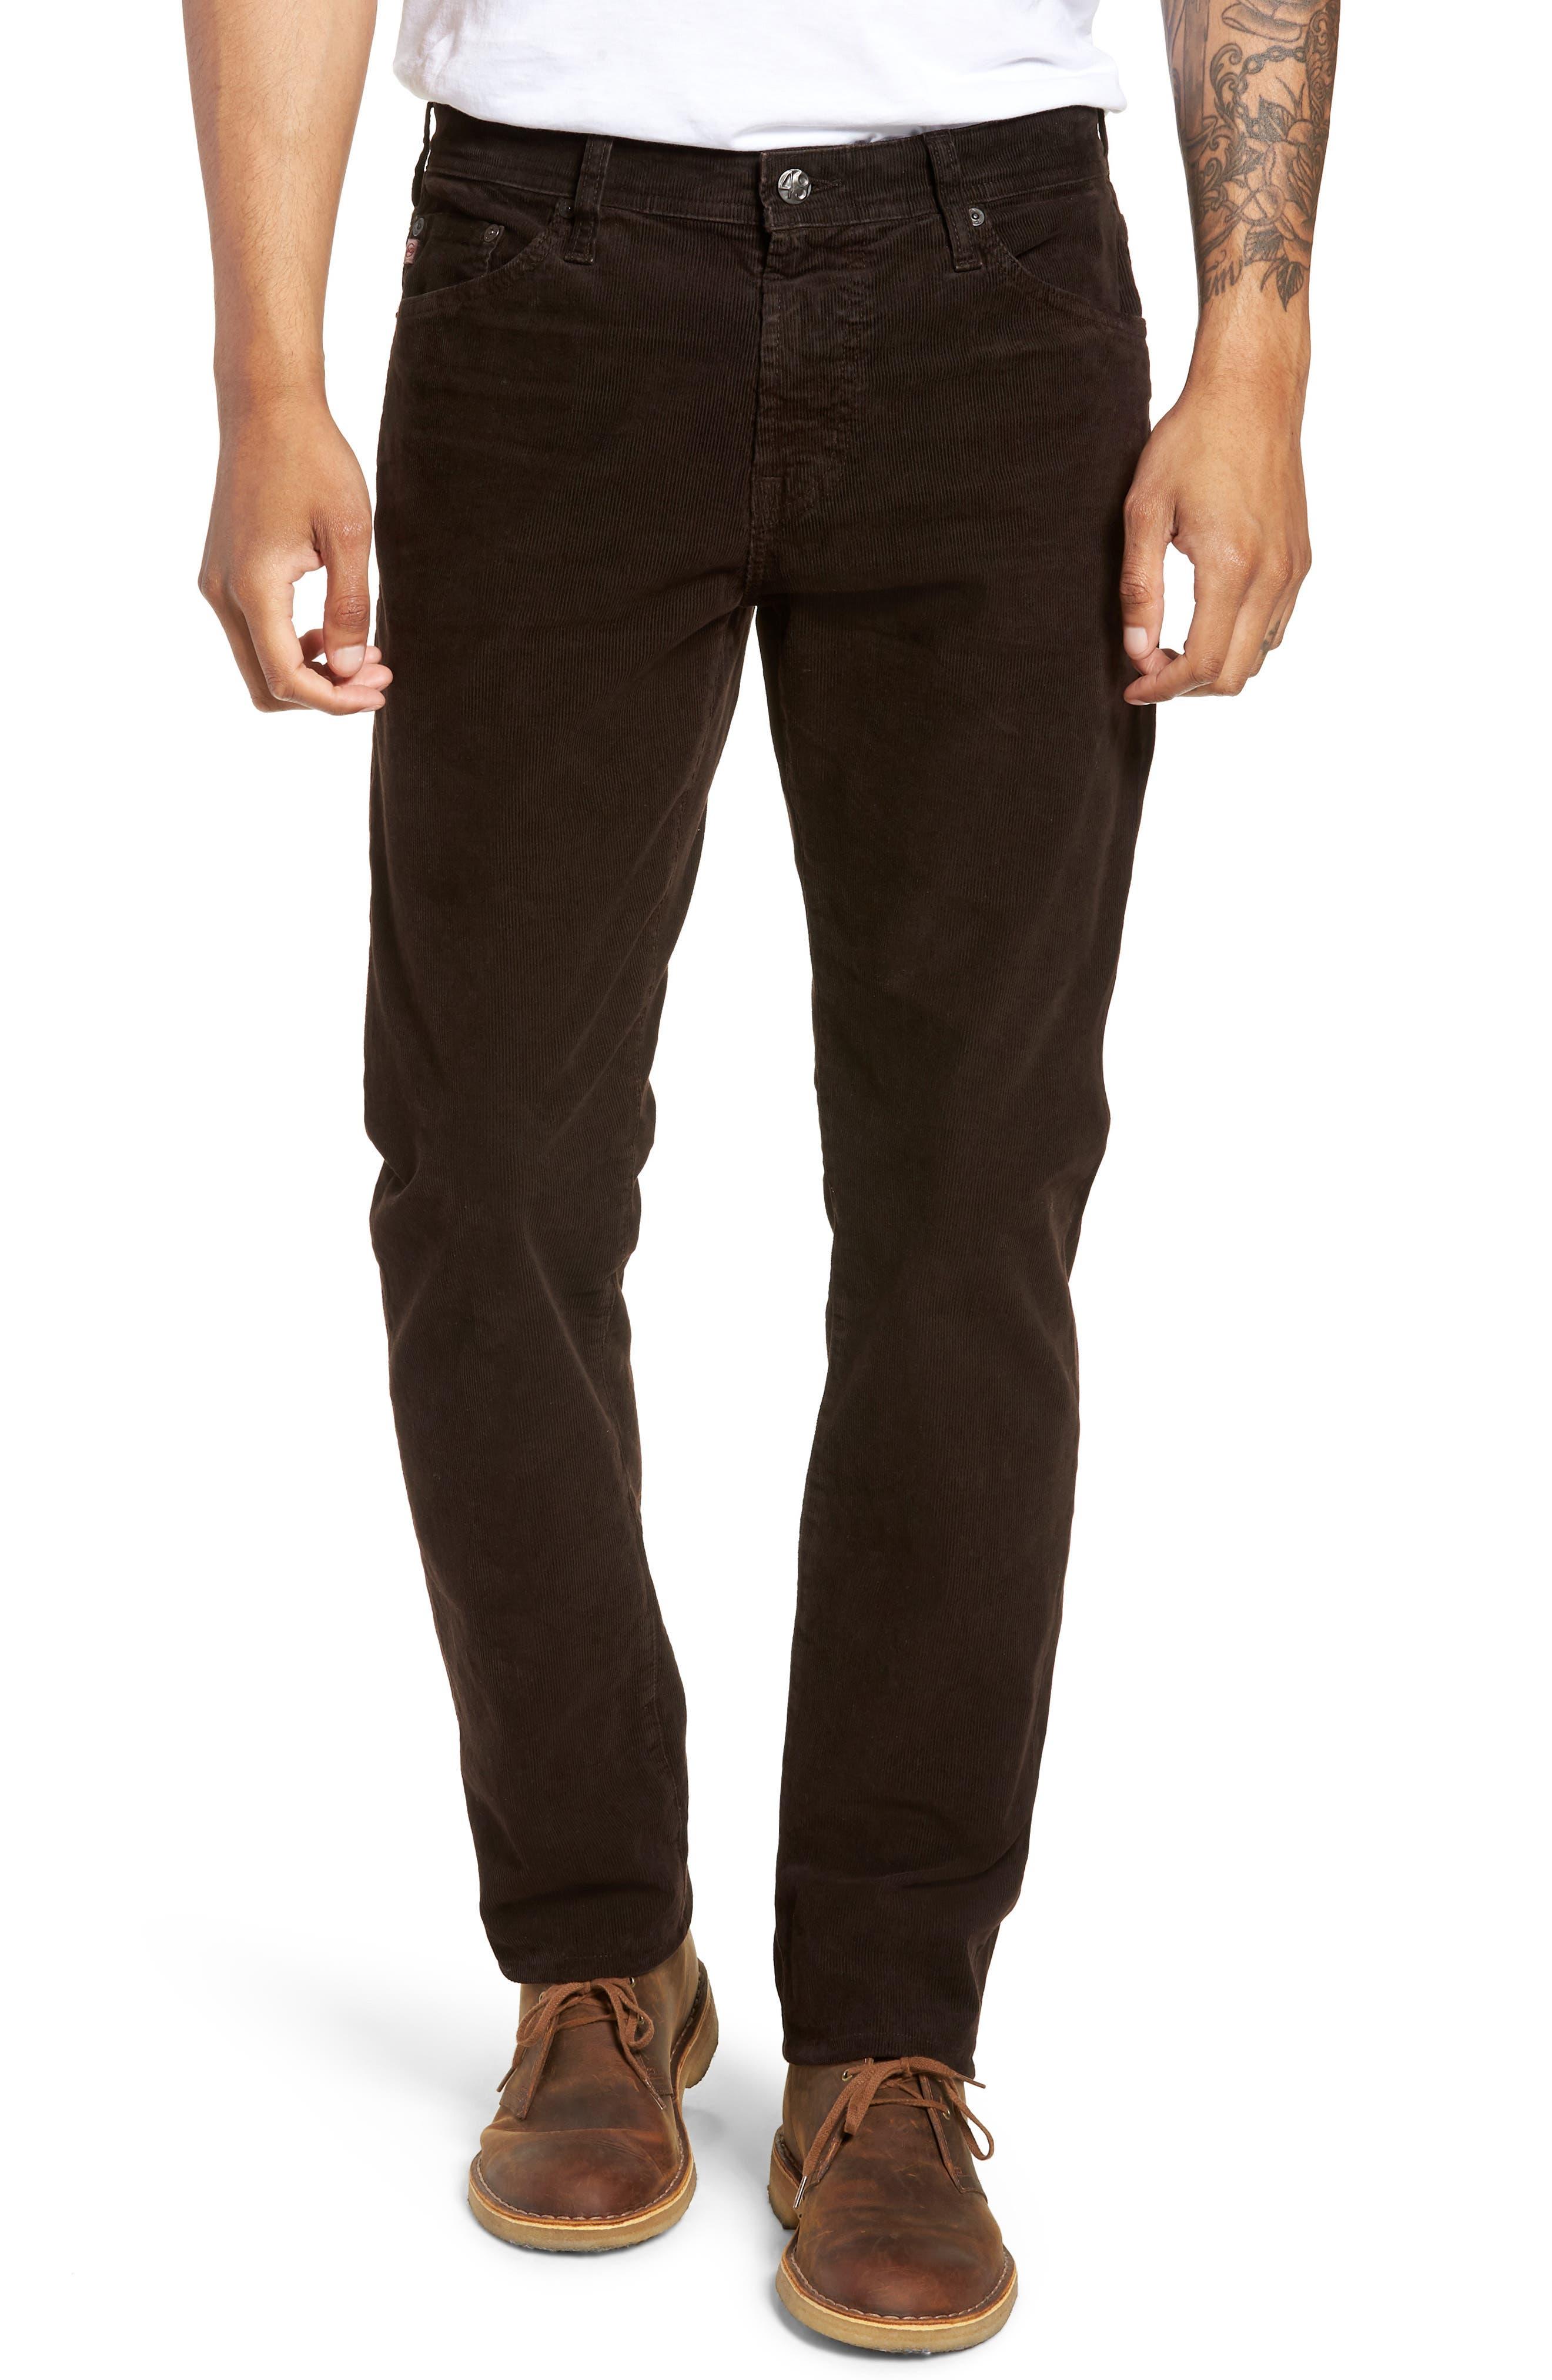 Everett Straight Leg Corduroy Pants,                             Main thumbnail 1, color,                             SULFUR SHUTTER